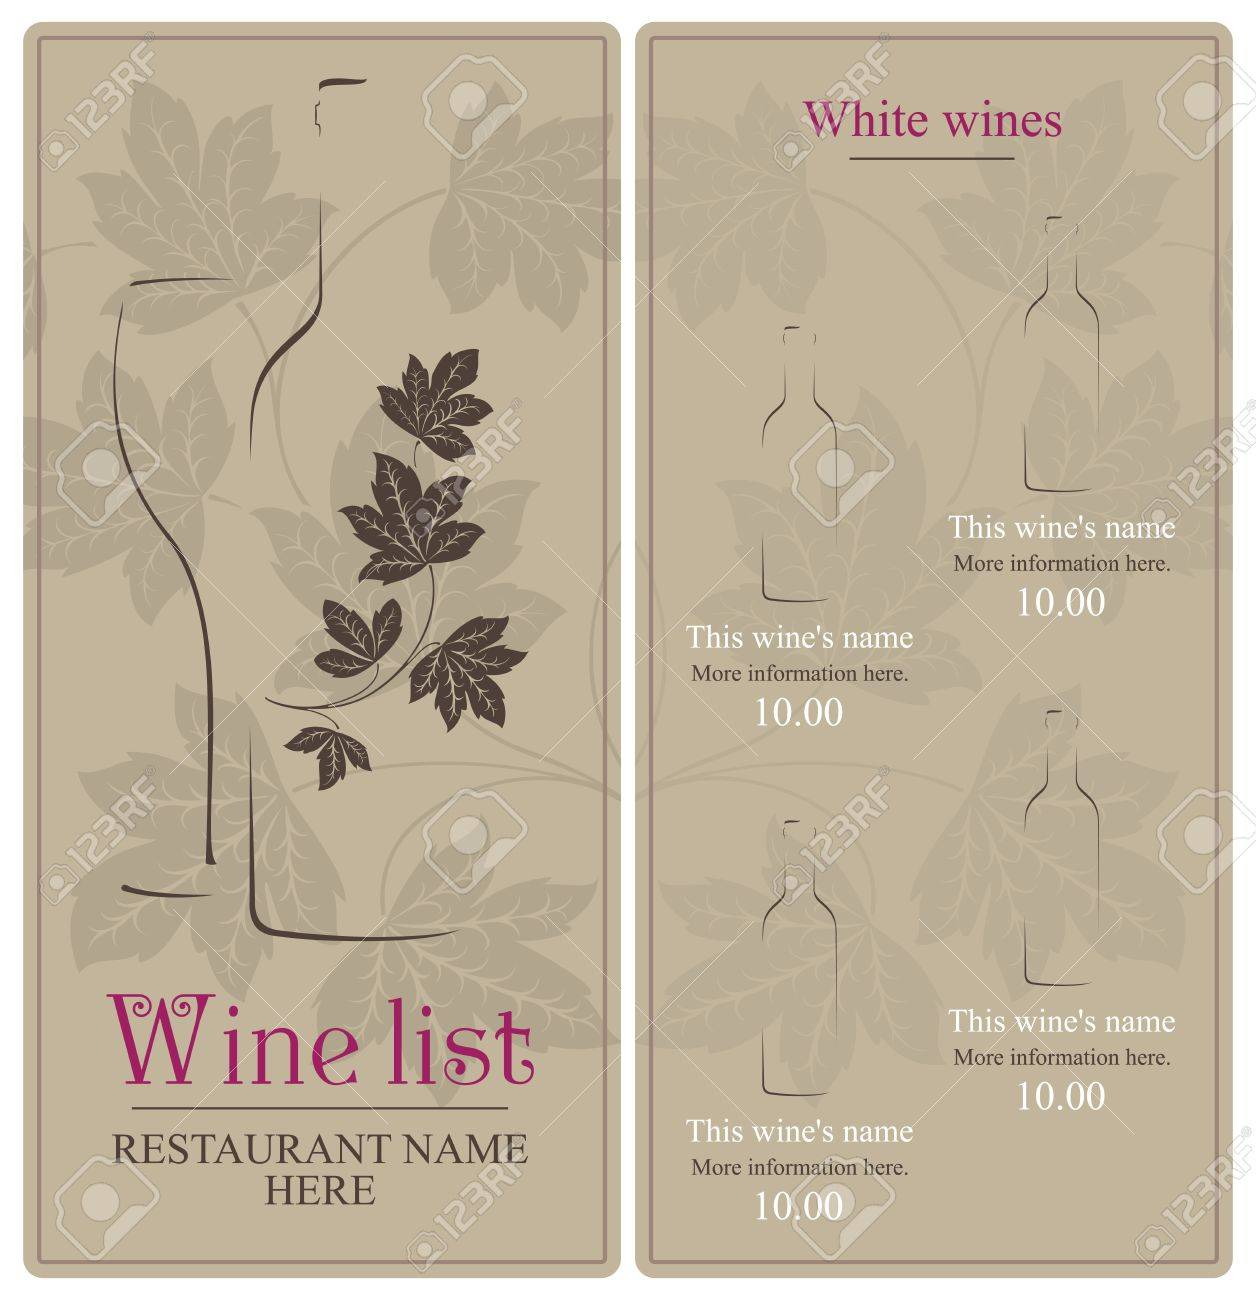 Wine list design Stock Vector - 11659360